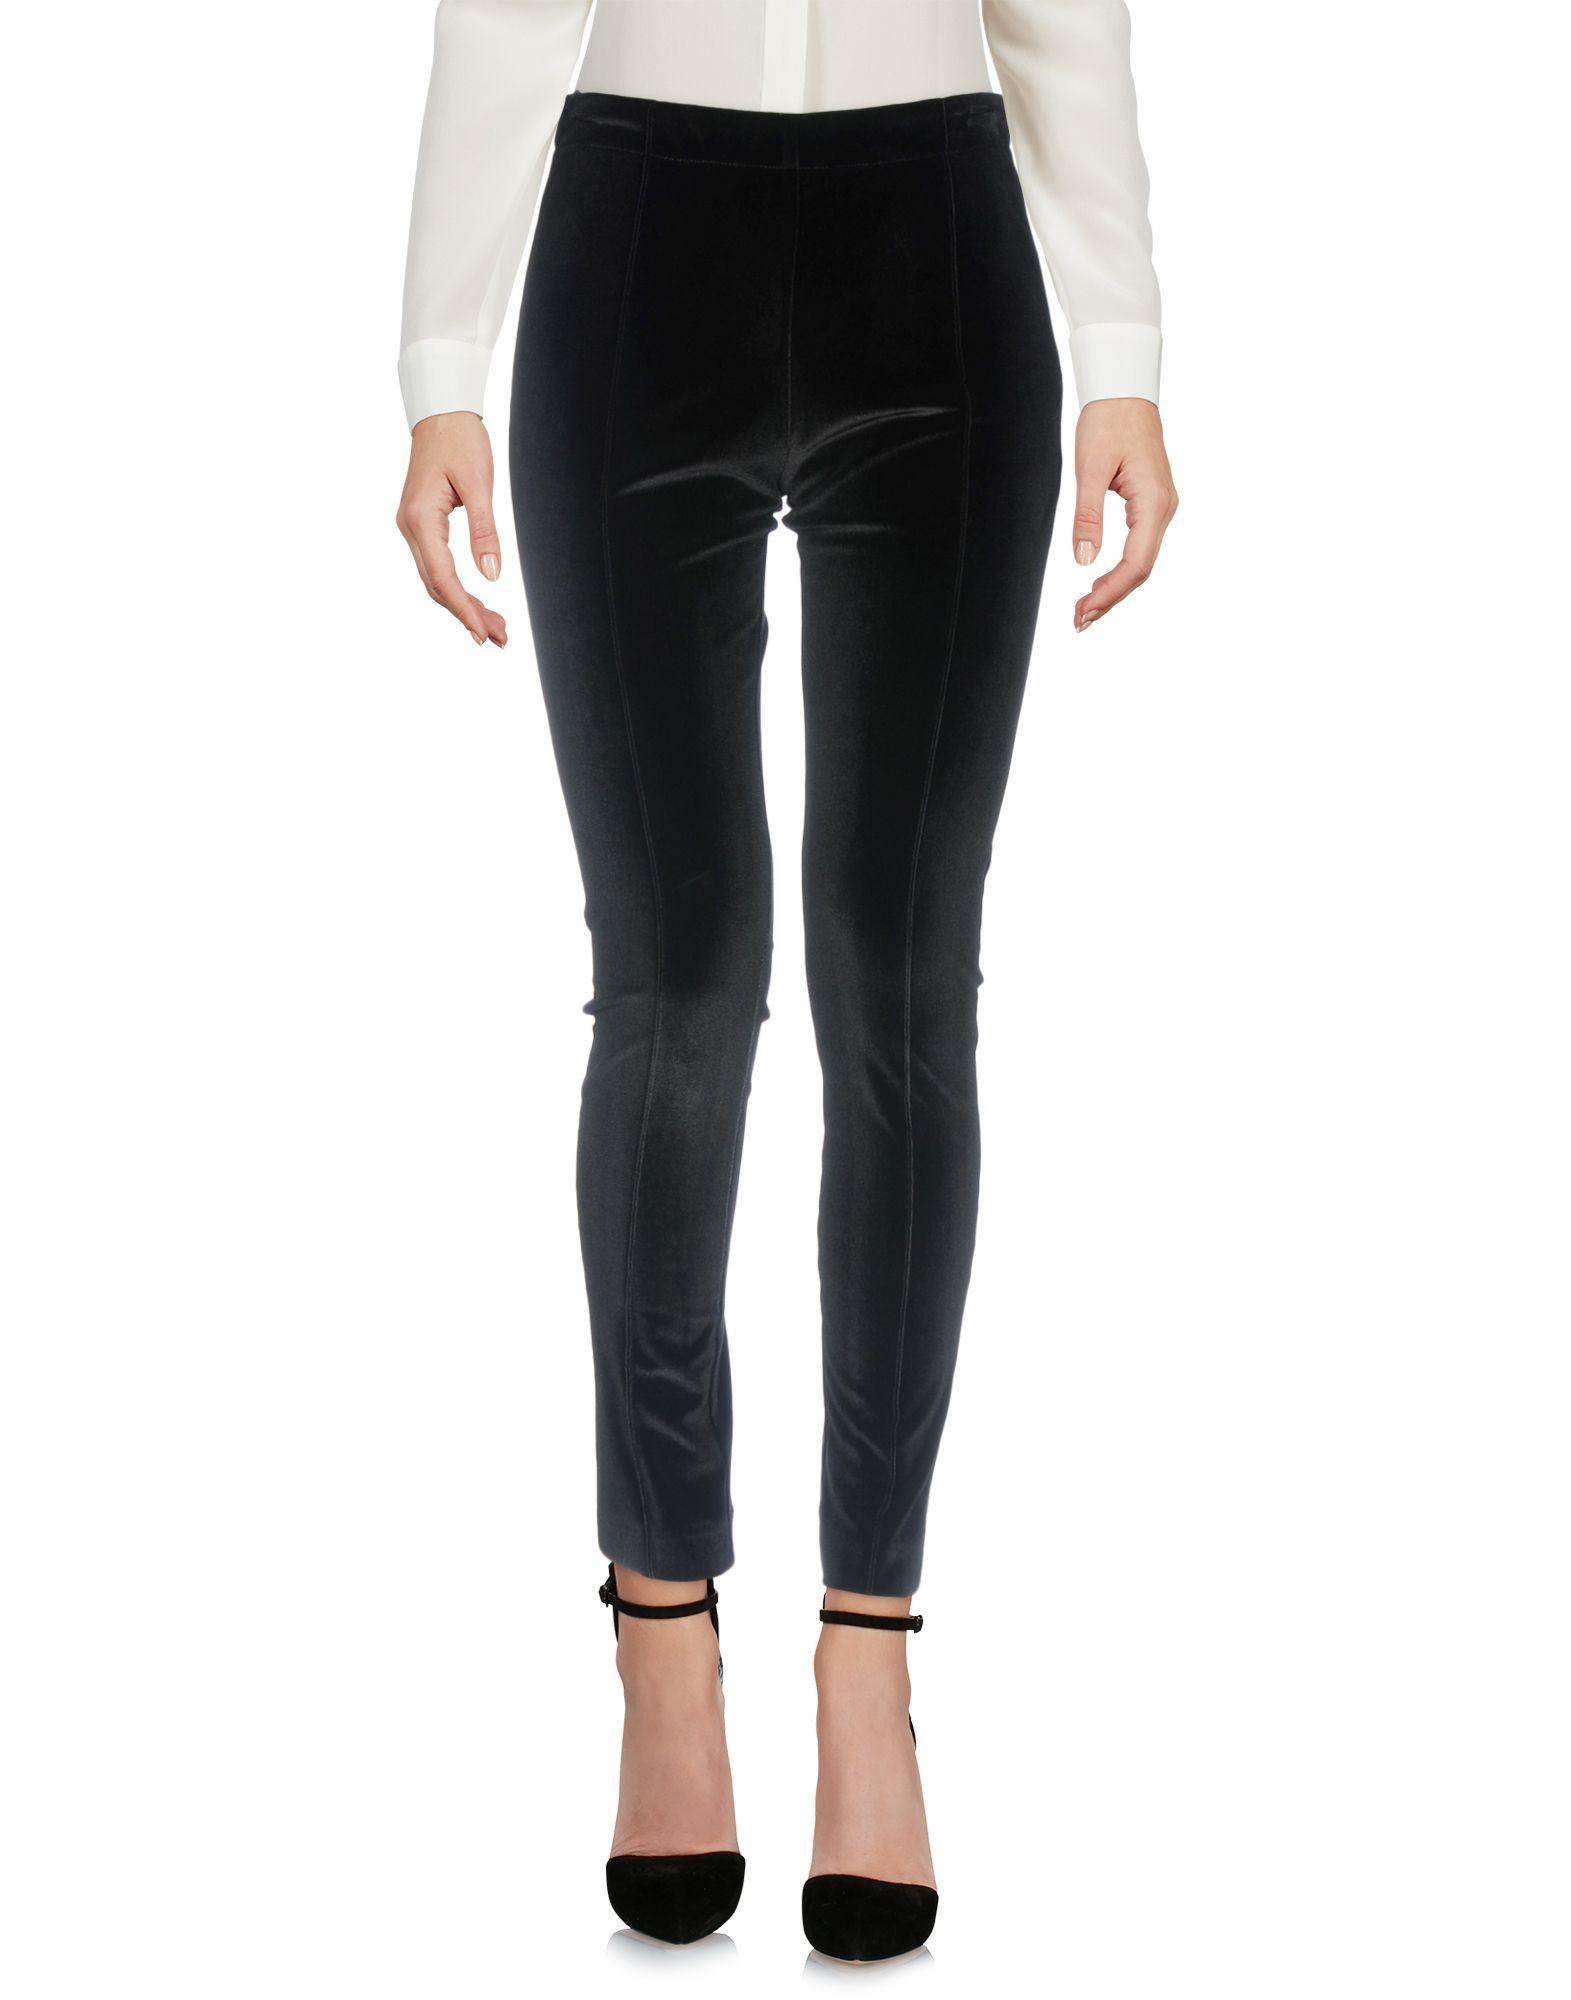 Trousers Tela Black Women's Polyester